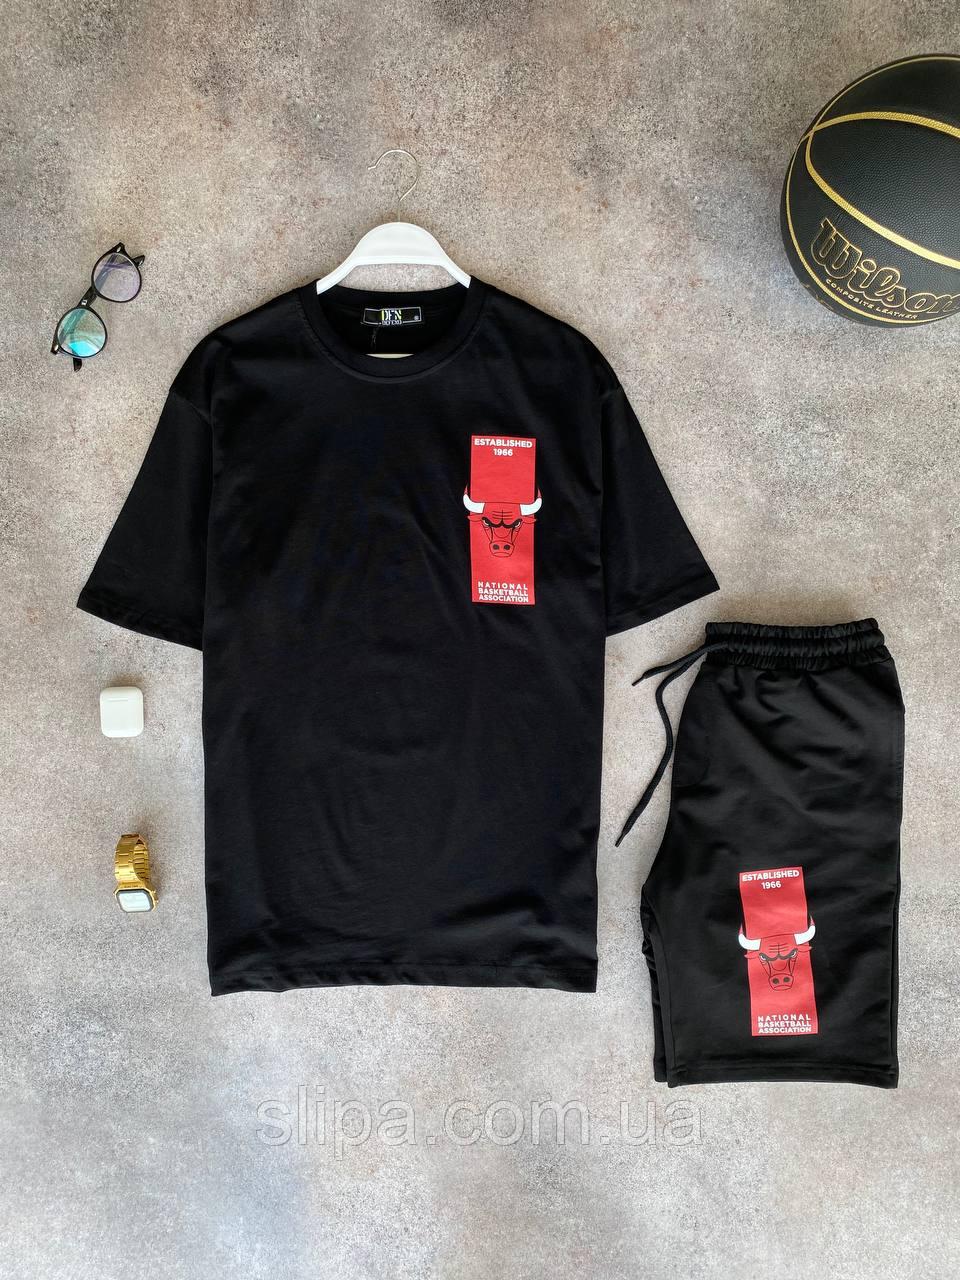 Чёрный летний оверсайз комплект DFN Bulls NBA футболка + шорты | Турция | 100% хлопок